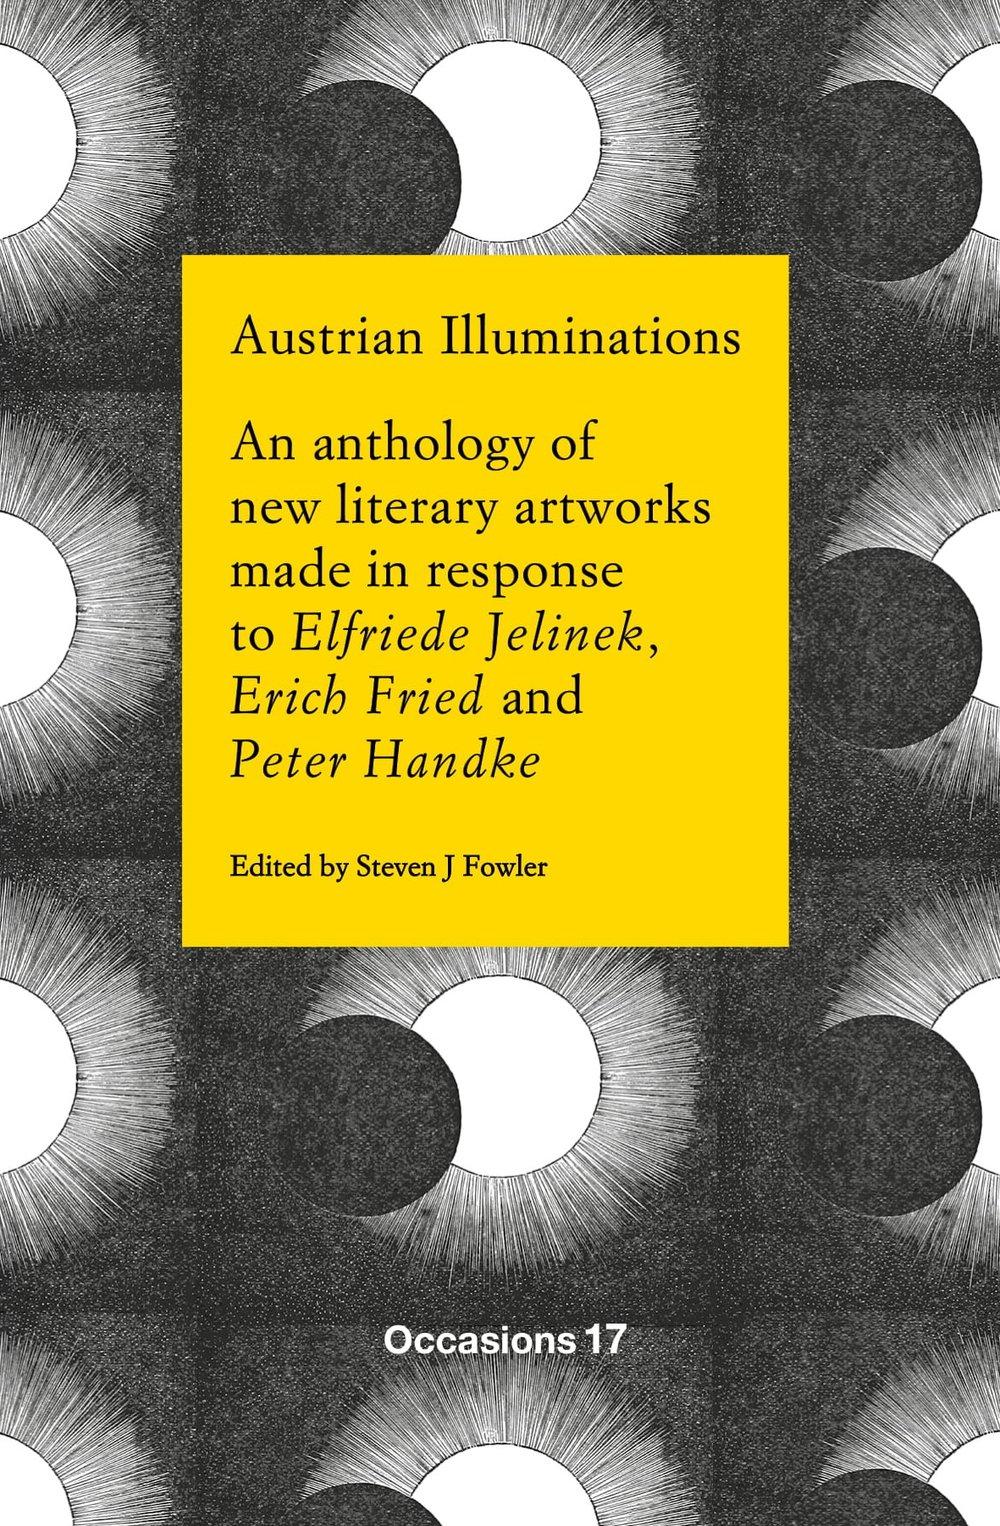 Austrian Illuminations :  Austrian Cultural Forum, Occasions Series 17